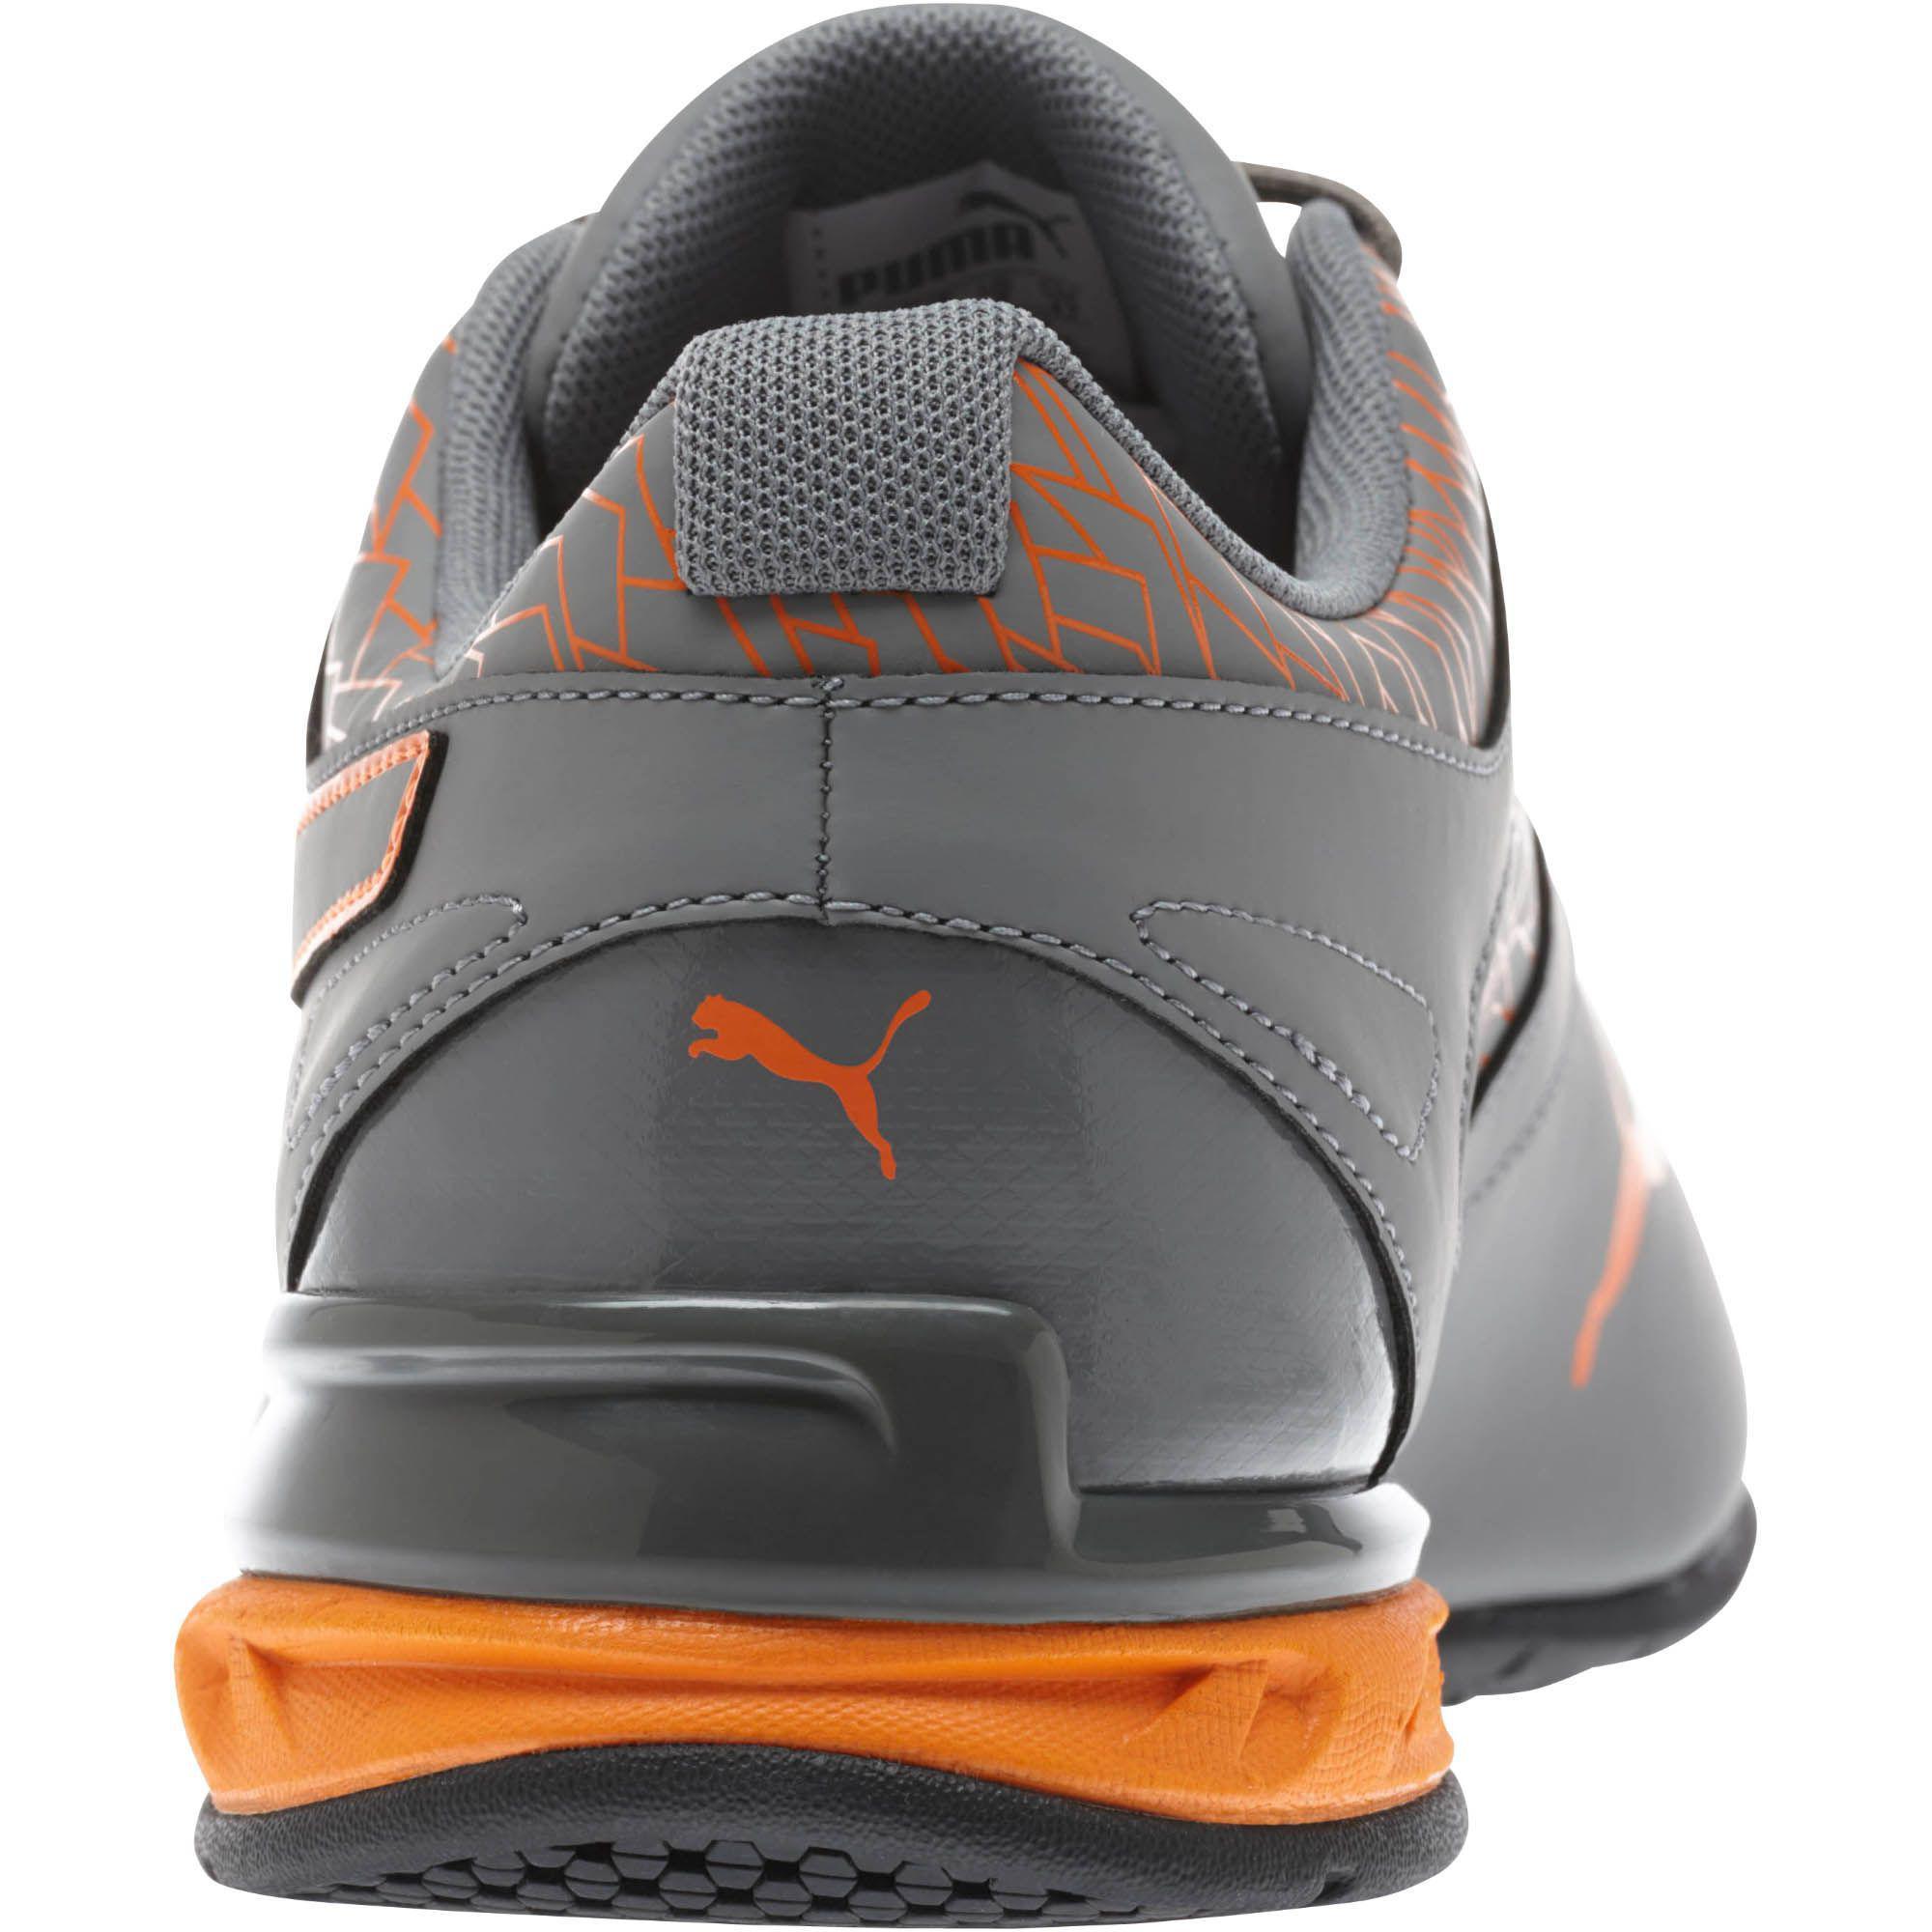 ea7d54200c PUMA Tazon 6 Fracture Men's Running Shoes in Gray for Men - Lyst